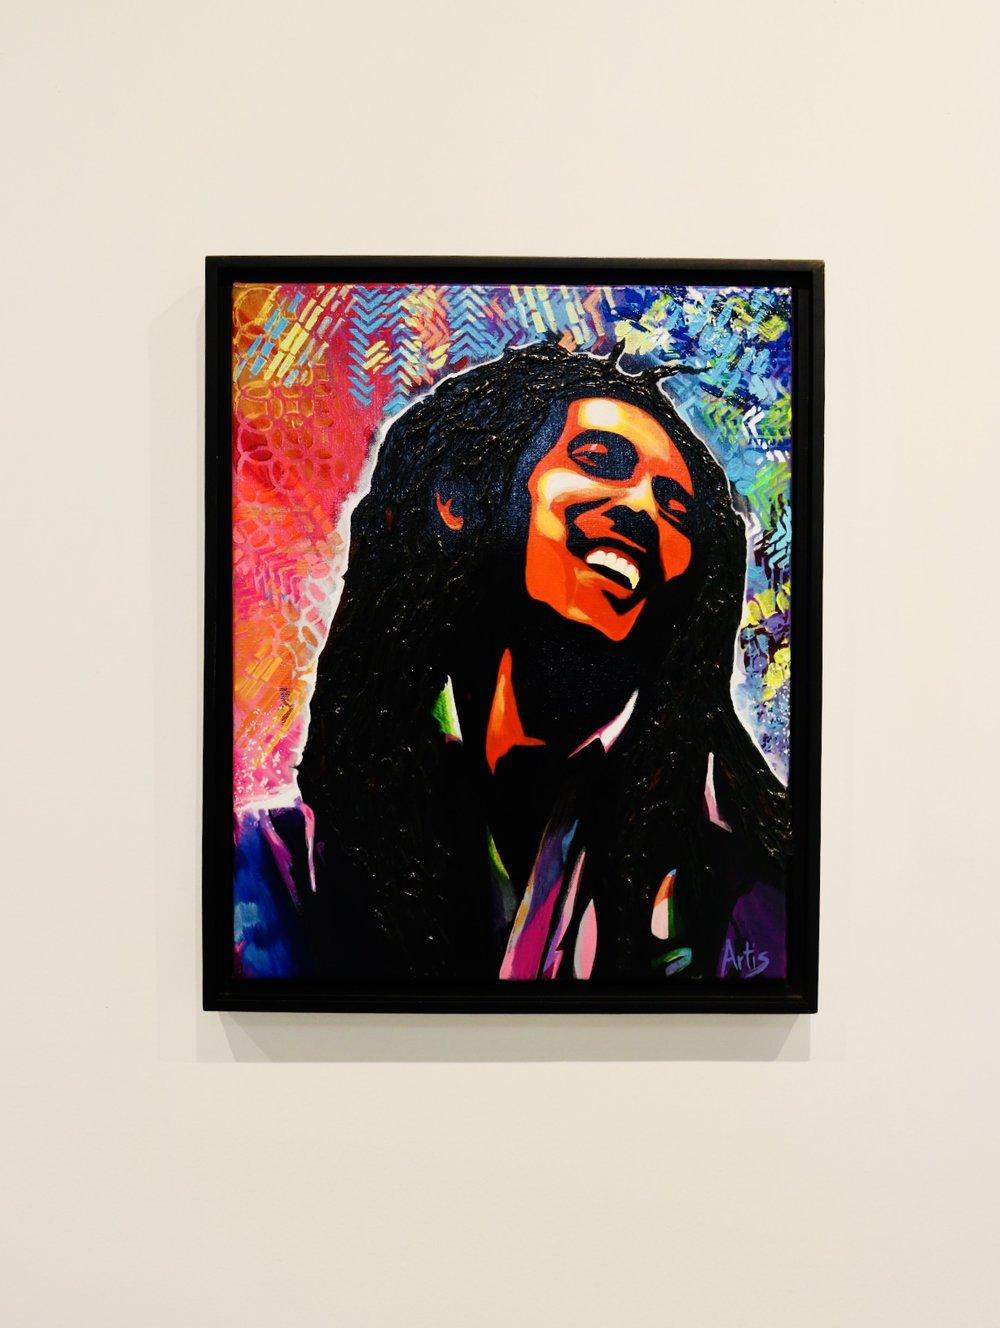 Dredlock Rasta 20 x 16 in. acrylic on canvas